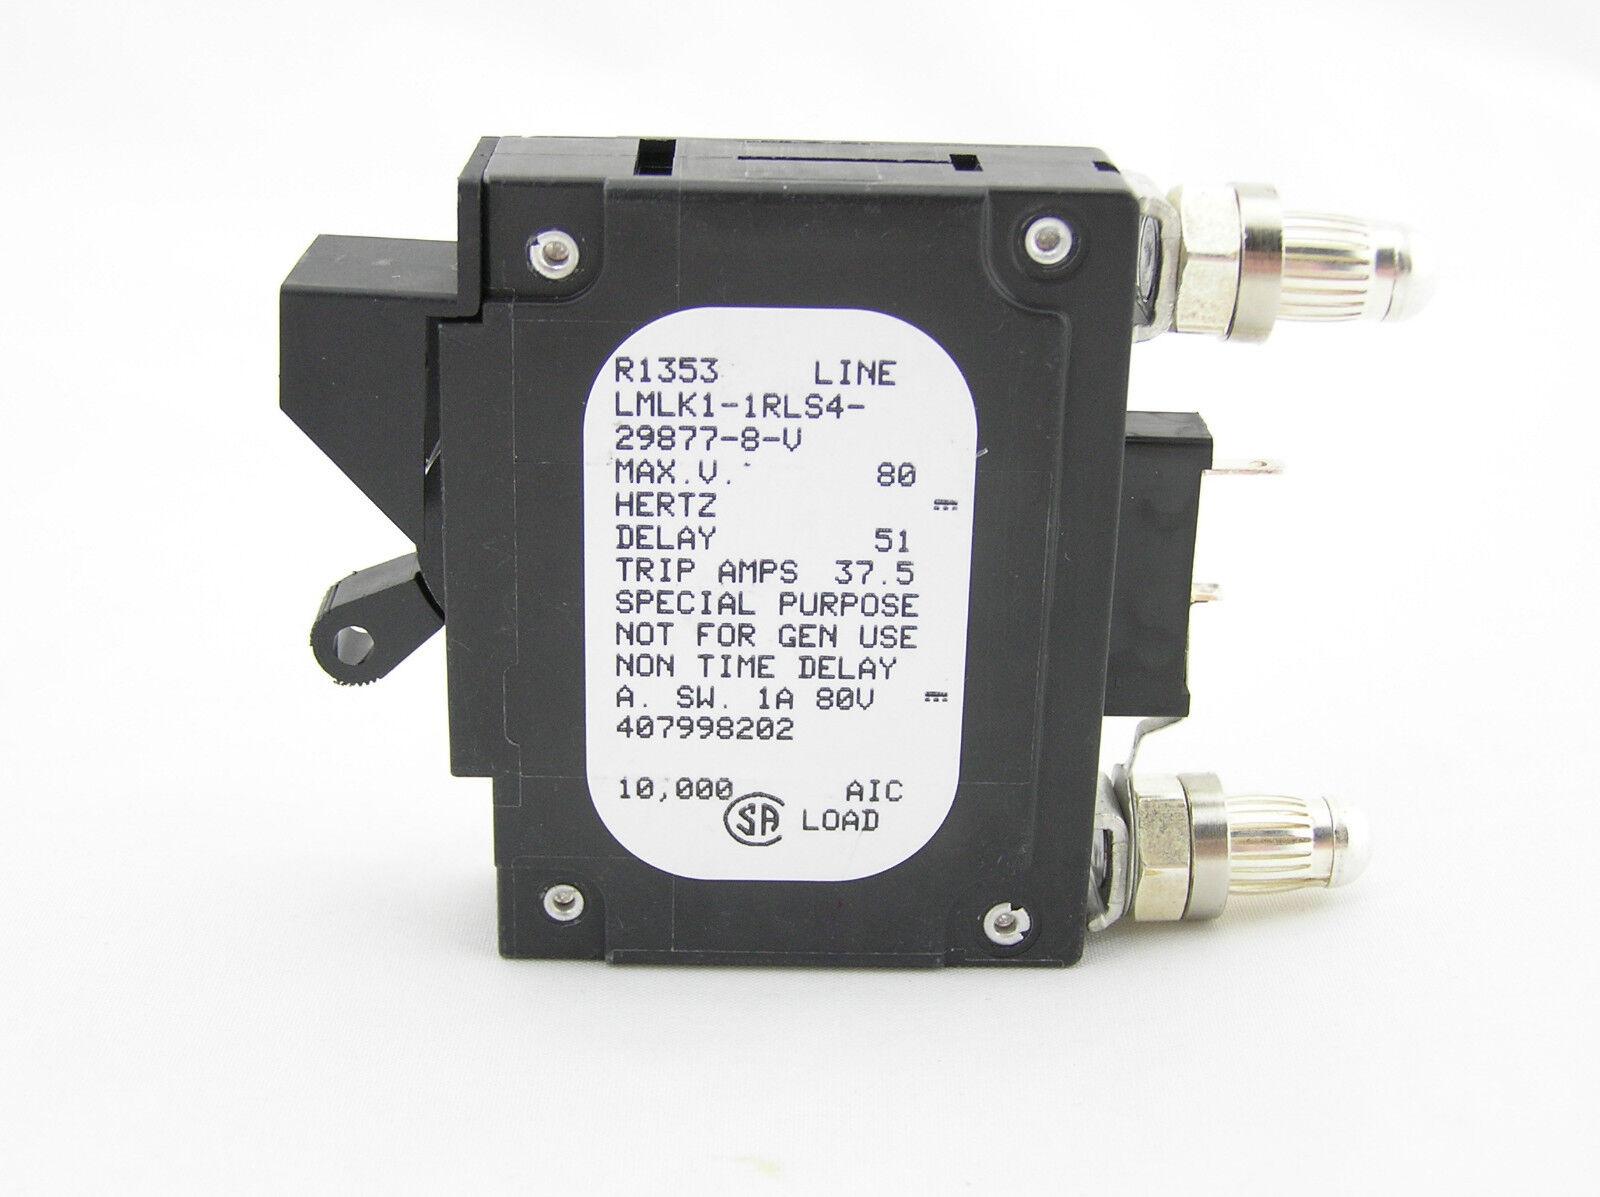 Airpax DC Circuit Breaker LMLK1-1RLS4-29877-8-V 30A 80VDC 1P Used